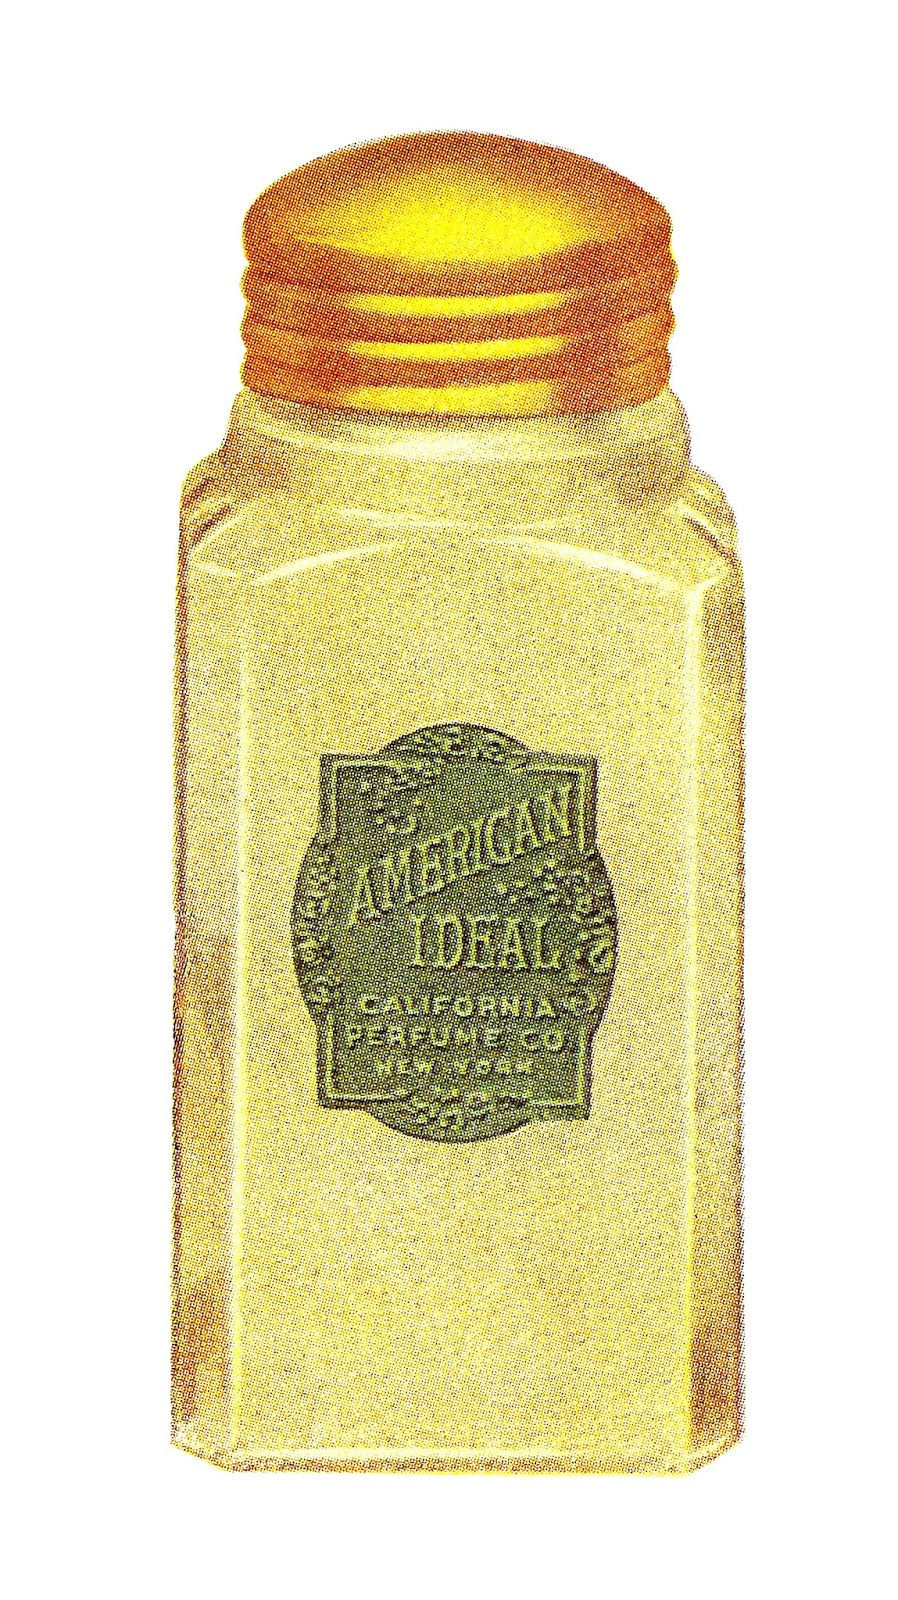 Antique Images: Vintage Beauty Product Digital Image ...